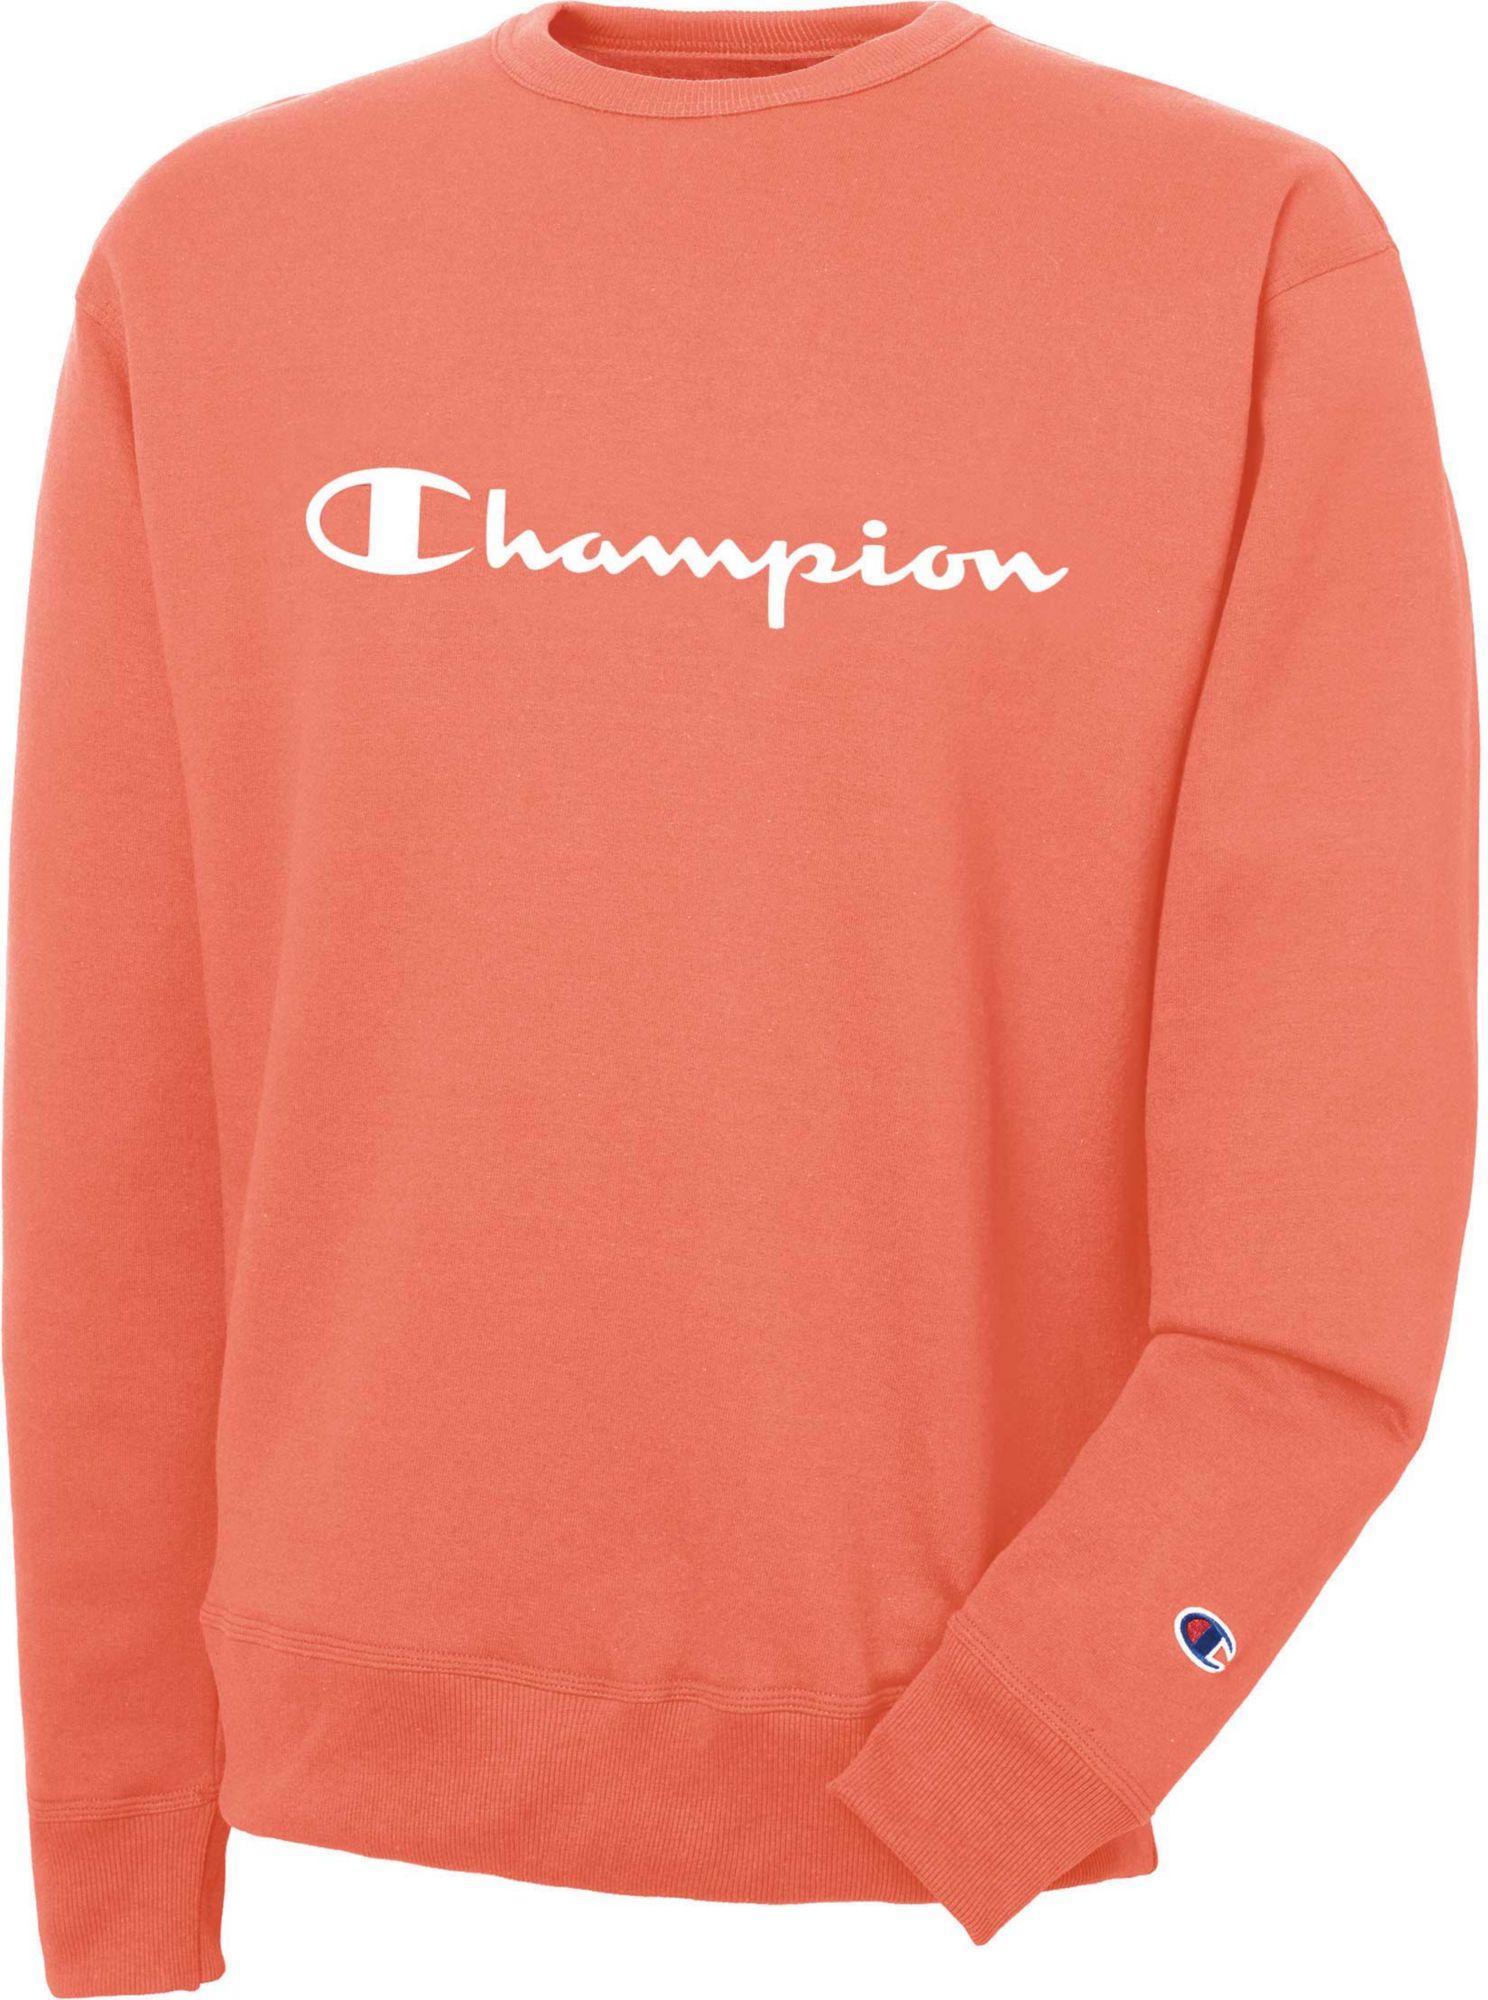 4c5a4628a Champion - Orange Lend Script Graphic Pullover for Men - Lyst. View  fullscreen